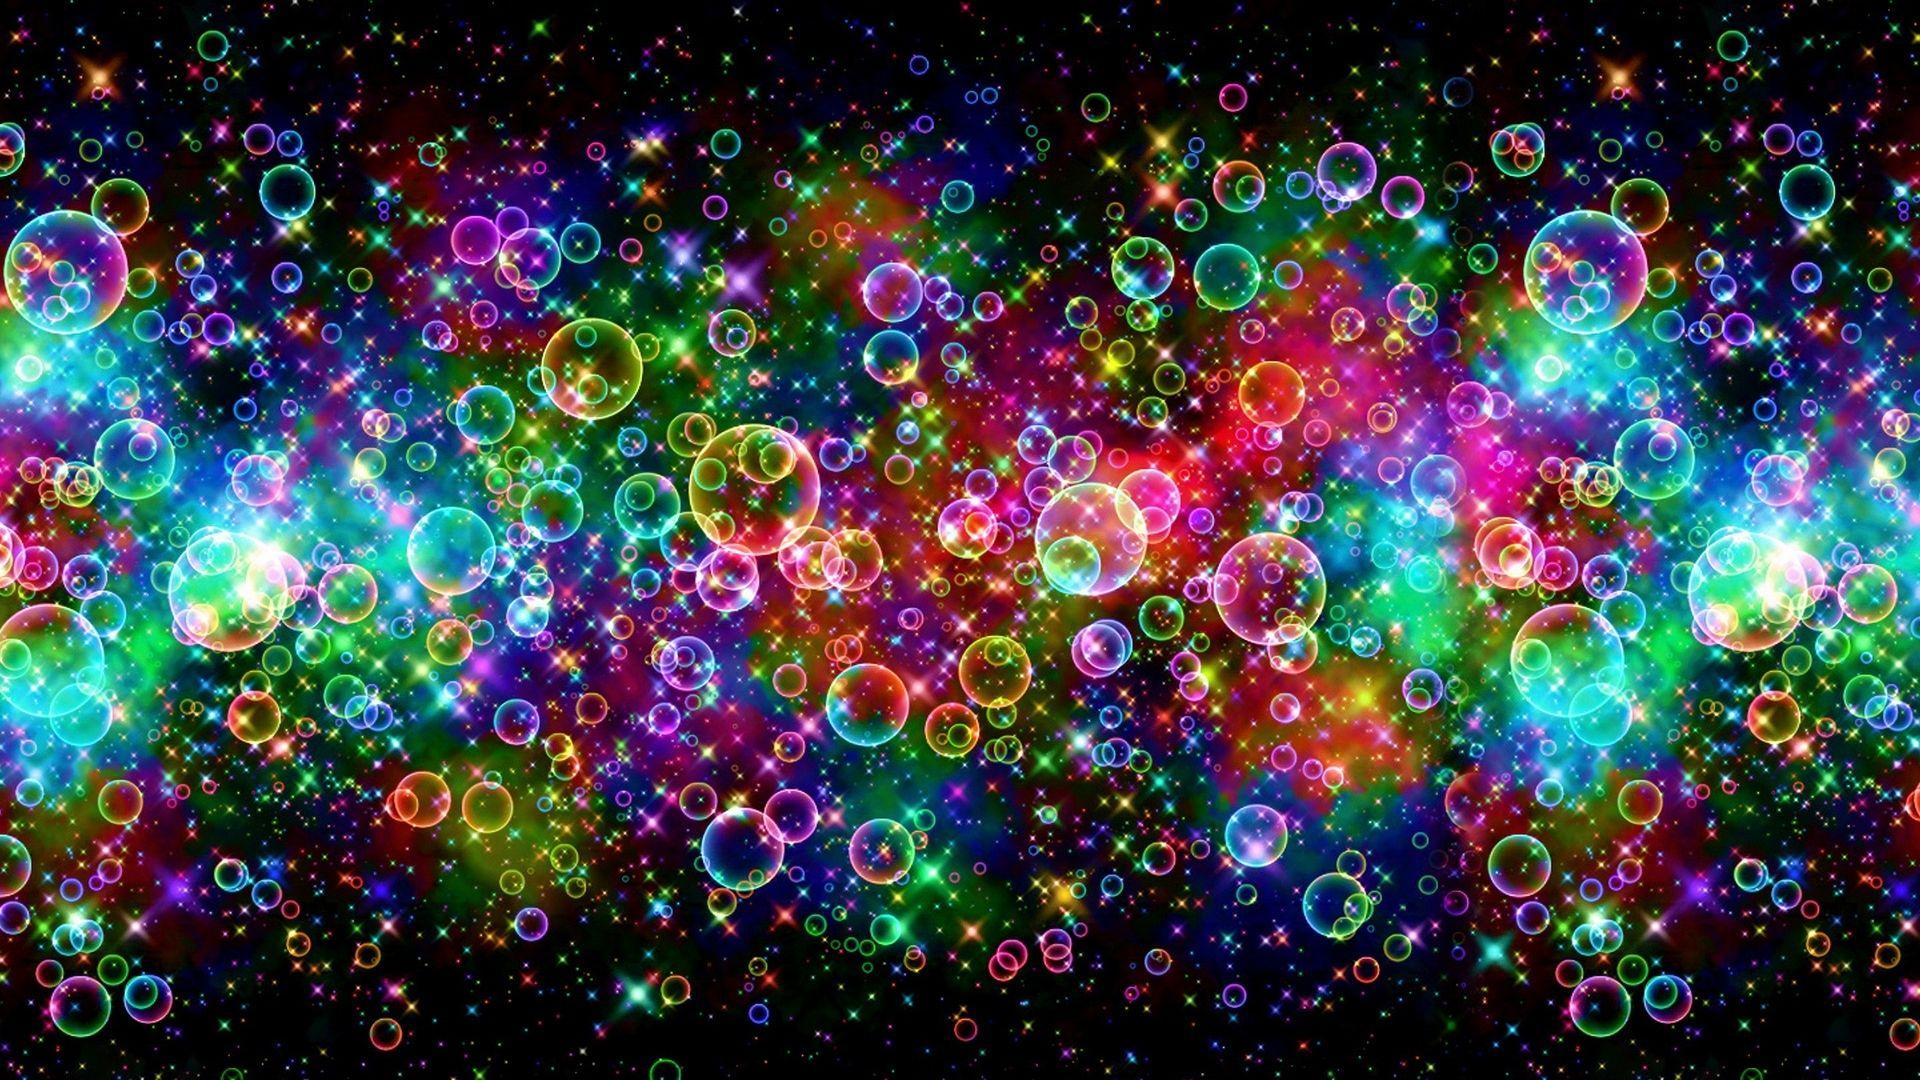 Colorful Bubbles Colorful Bubbles Hd Wallpapers Smashing Hd Wallpapers Cover Pics Cover Pics For Facebook Facebook Cover Images